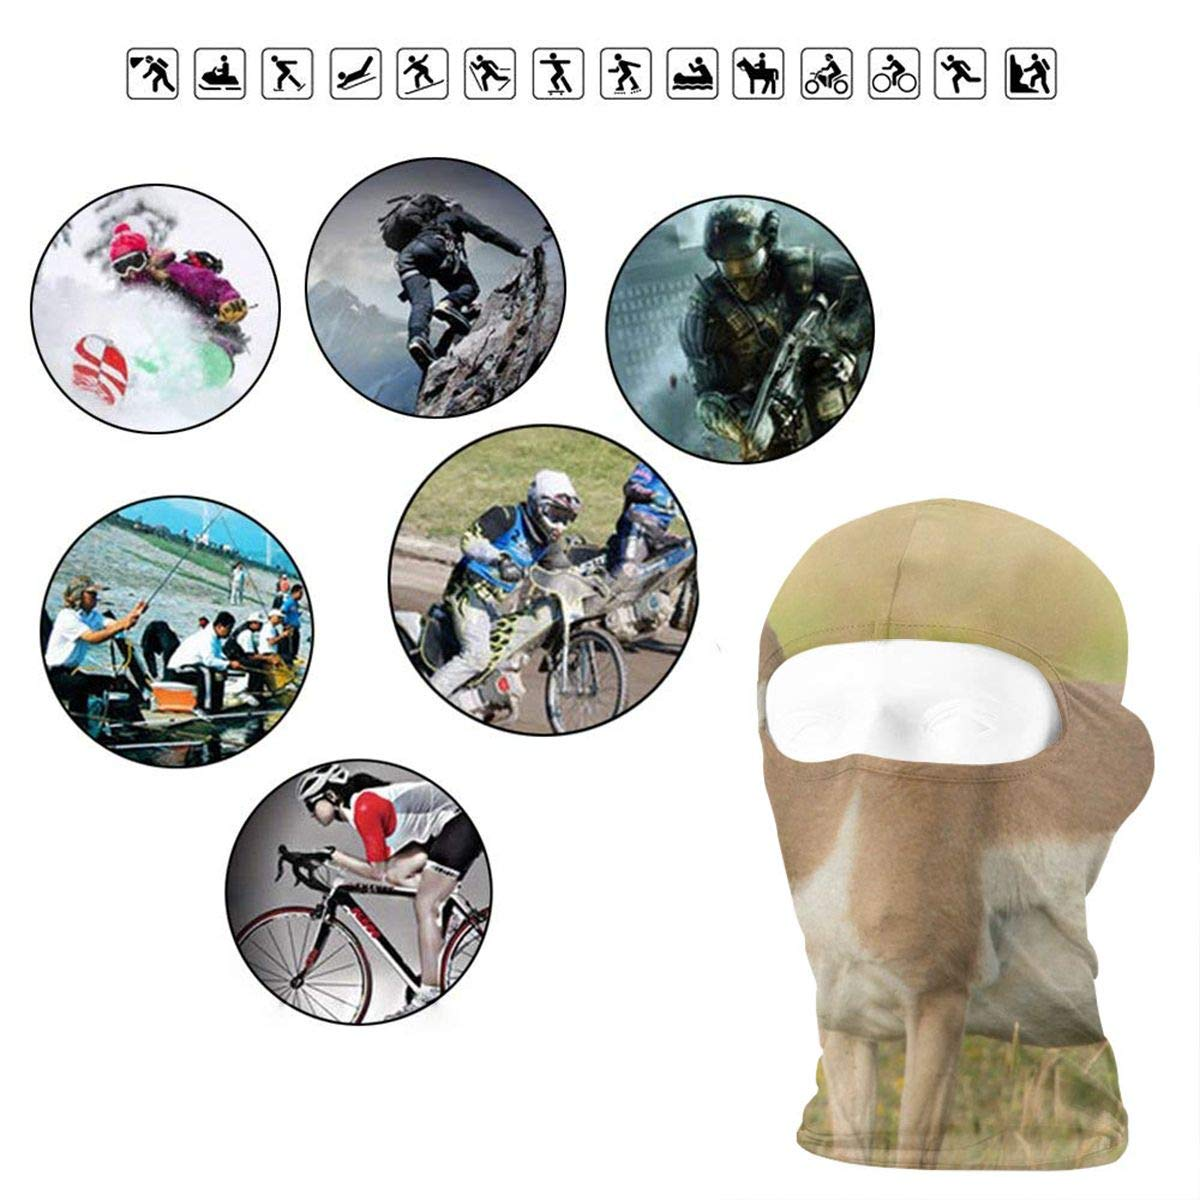 Balaclava Shining Red Poppies Watercolor Full Face Masks Ski Mask Hot Mens Motorcycle For Cycling